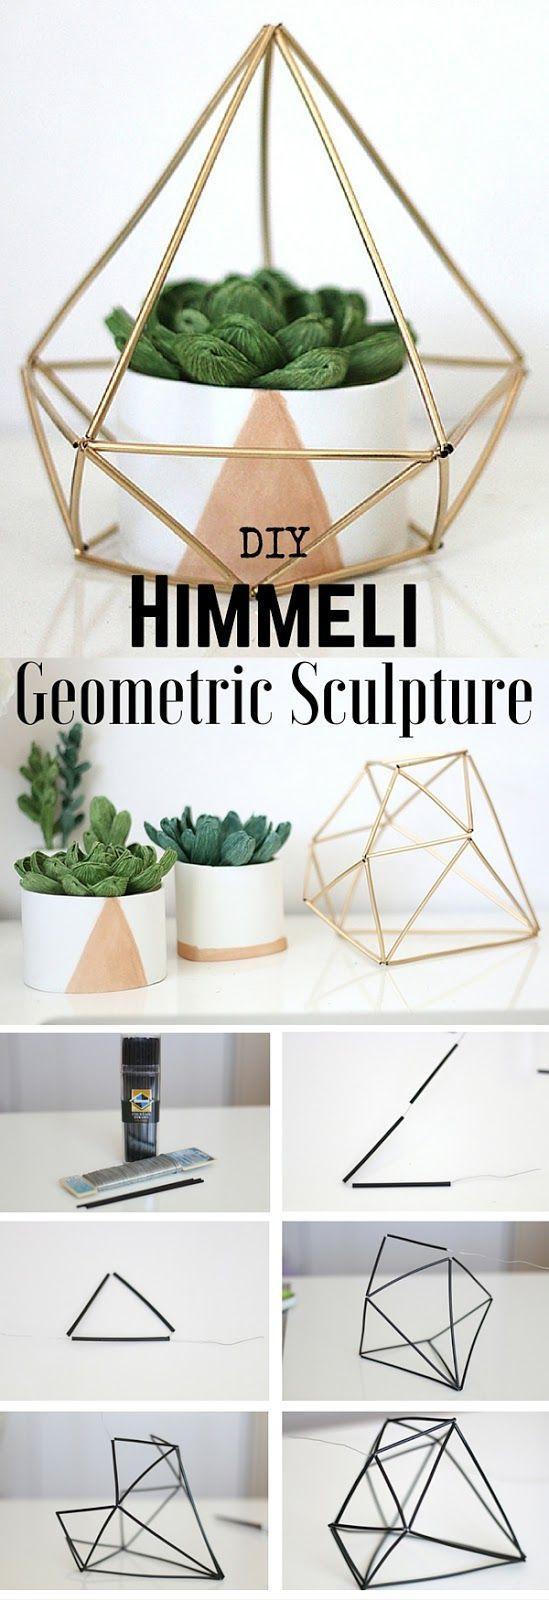 Photo of Easy Diy Home Decor Ideas – Design Your Own Geometric Sculpture #de